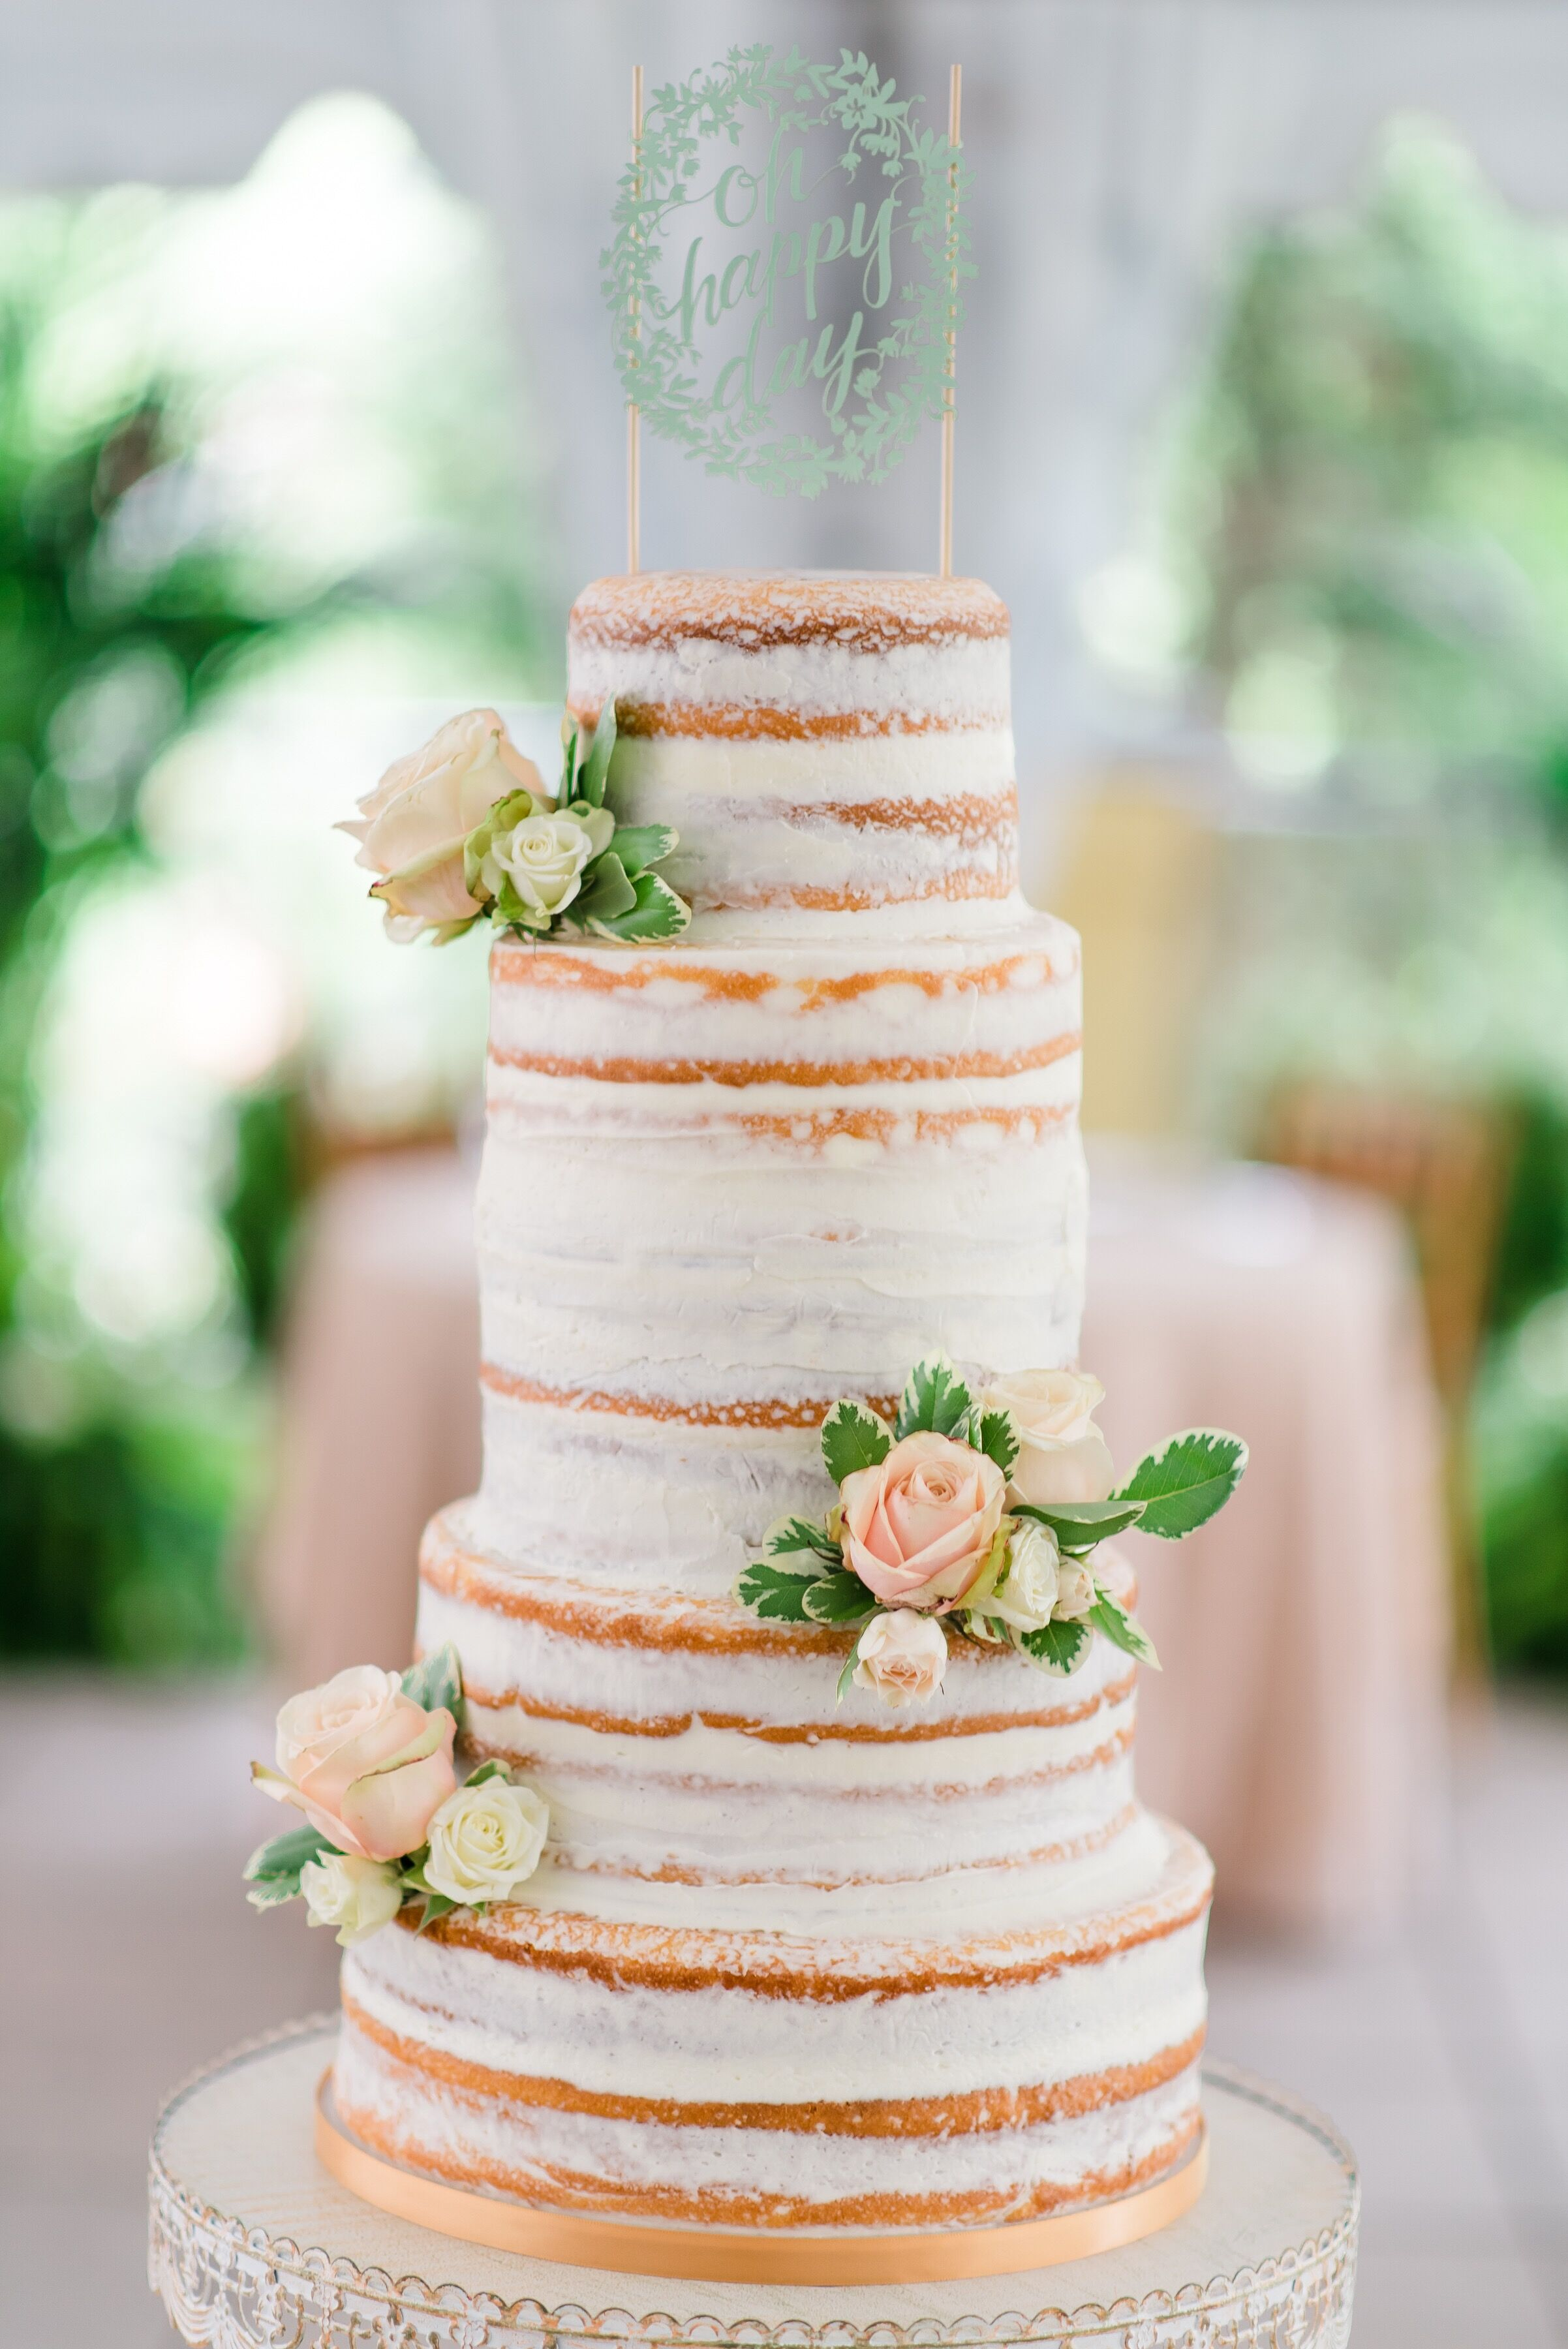 Artistic Cake Creations